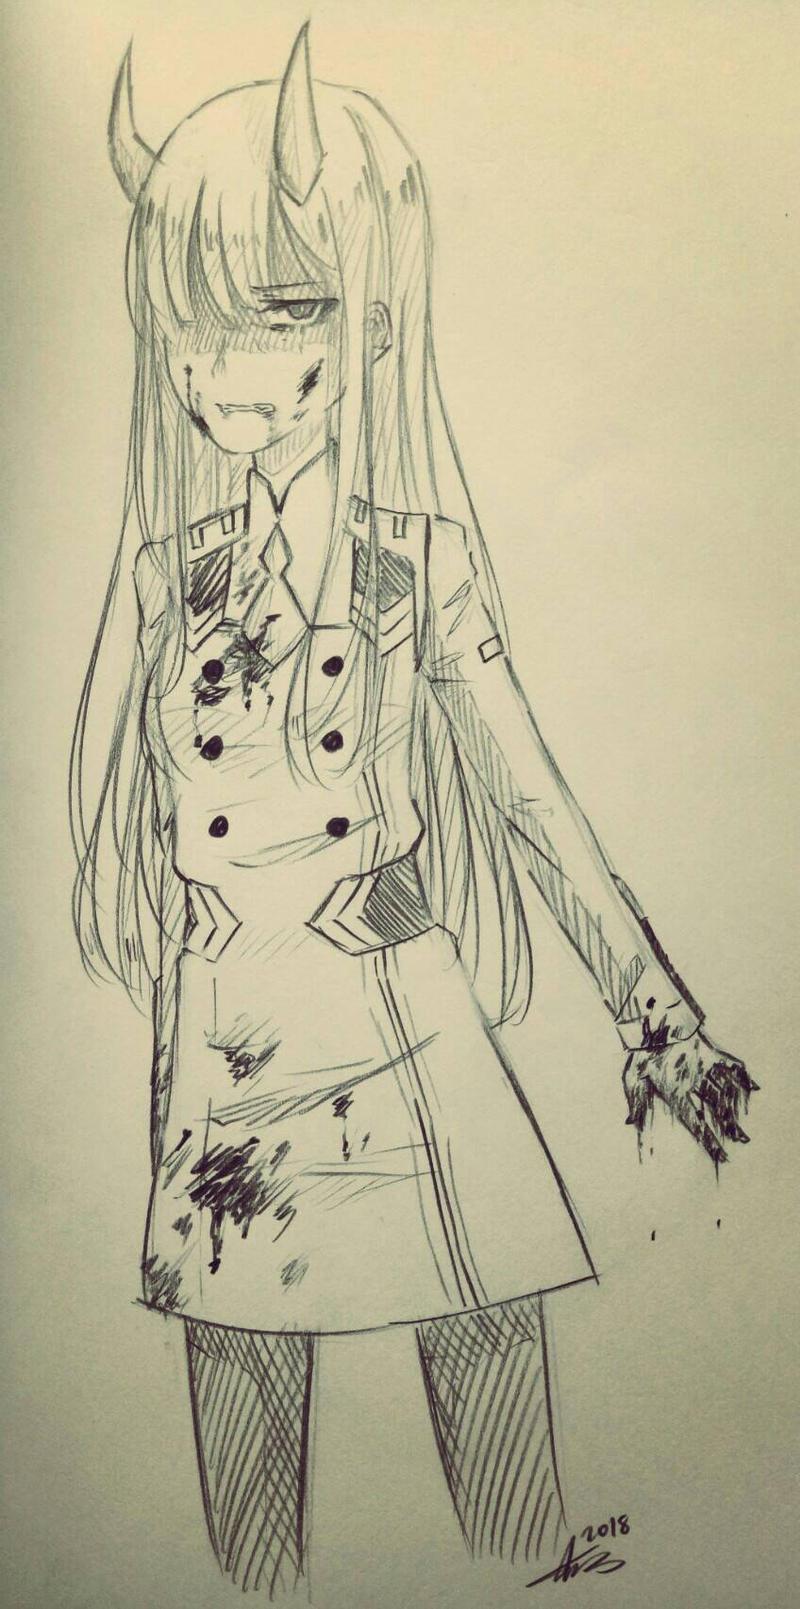 Become Human by Kamikoroshu